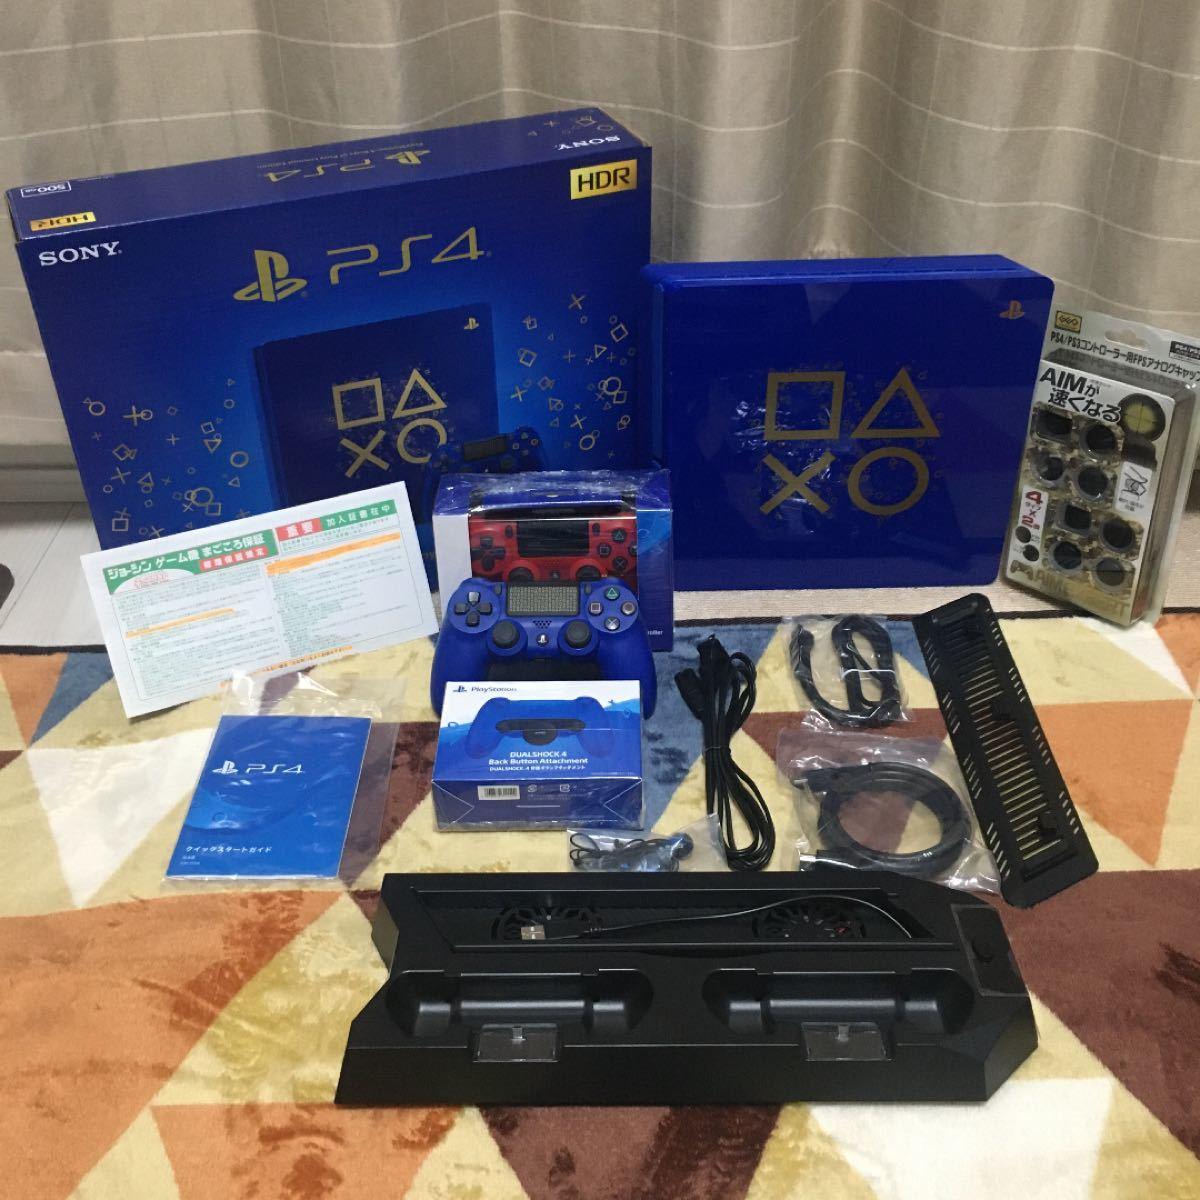 PS4 本体 DAYS of PLAY PlayStation4プレステ4 おまけ付き(CUH-ZCT2J)マグマレッド2100A